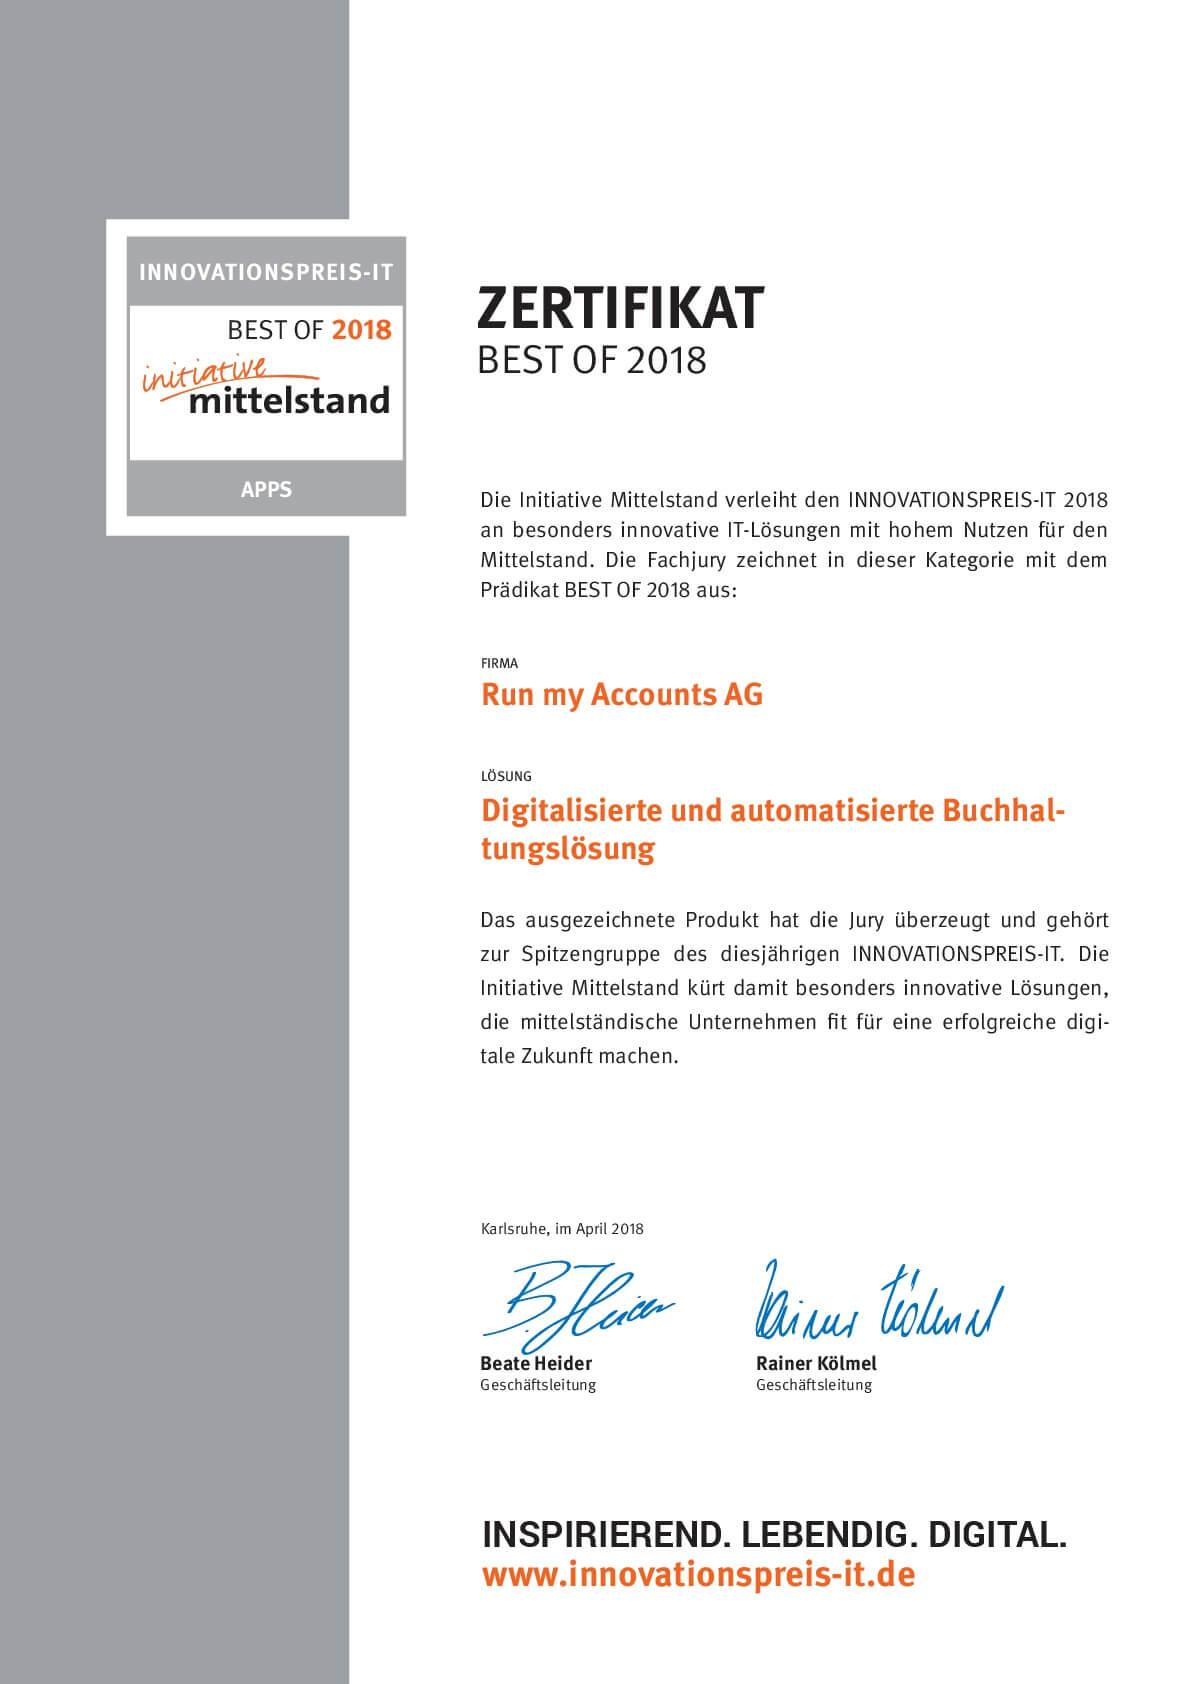 Innovationspreis-IT - Run my Accounts